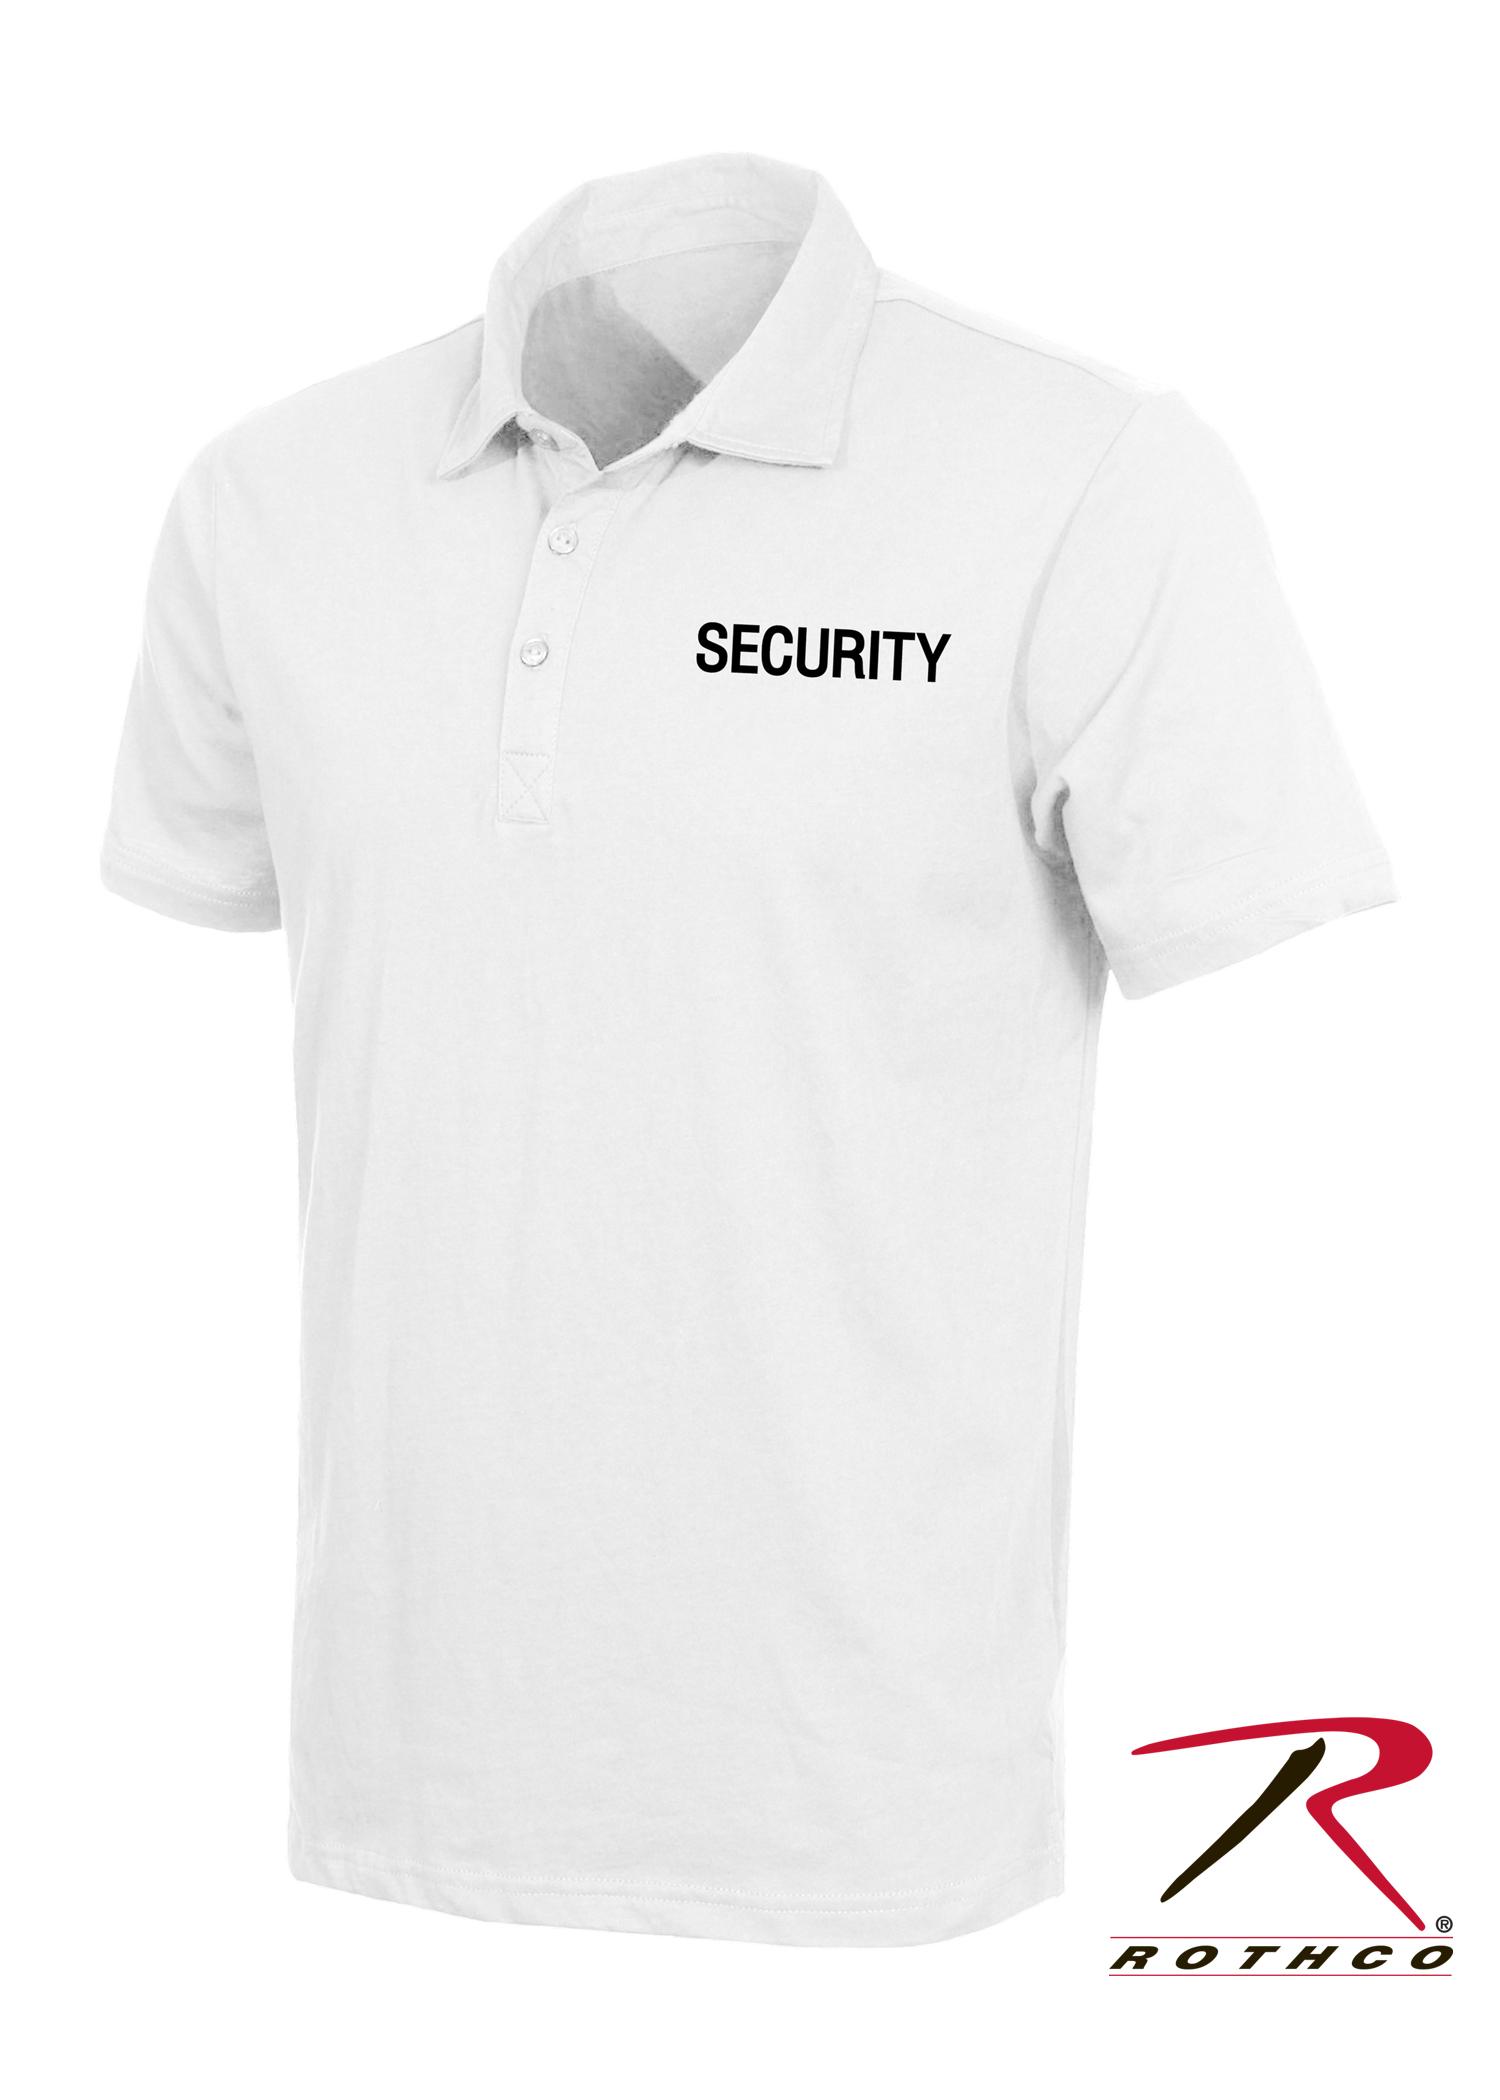 White Security Printed Polo Shirt